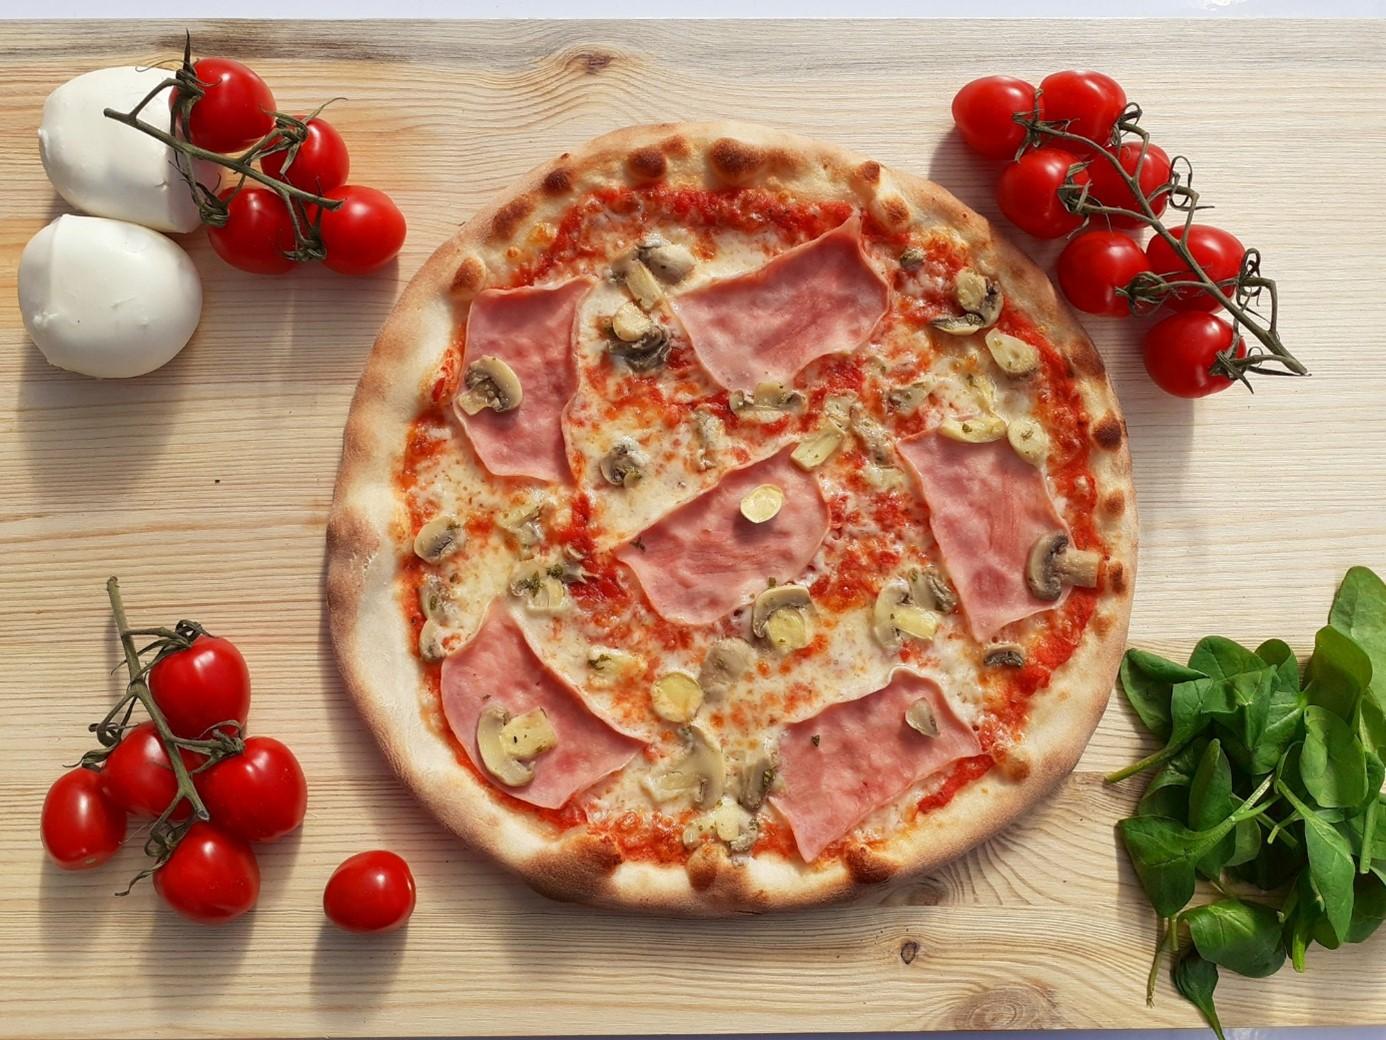 chlazená pizza na dopečení